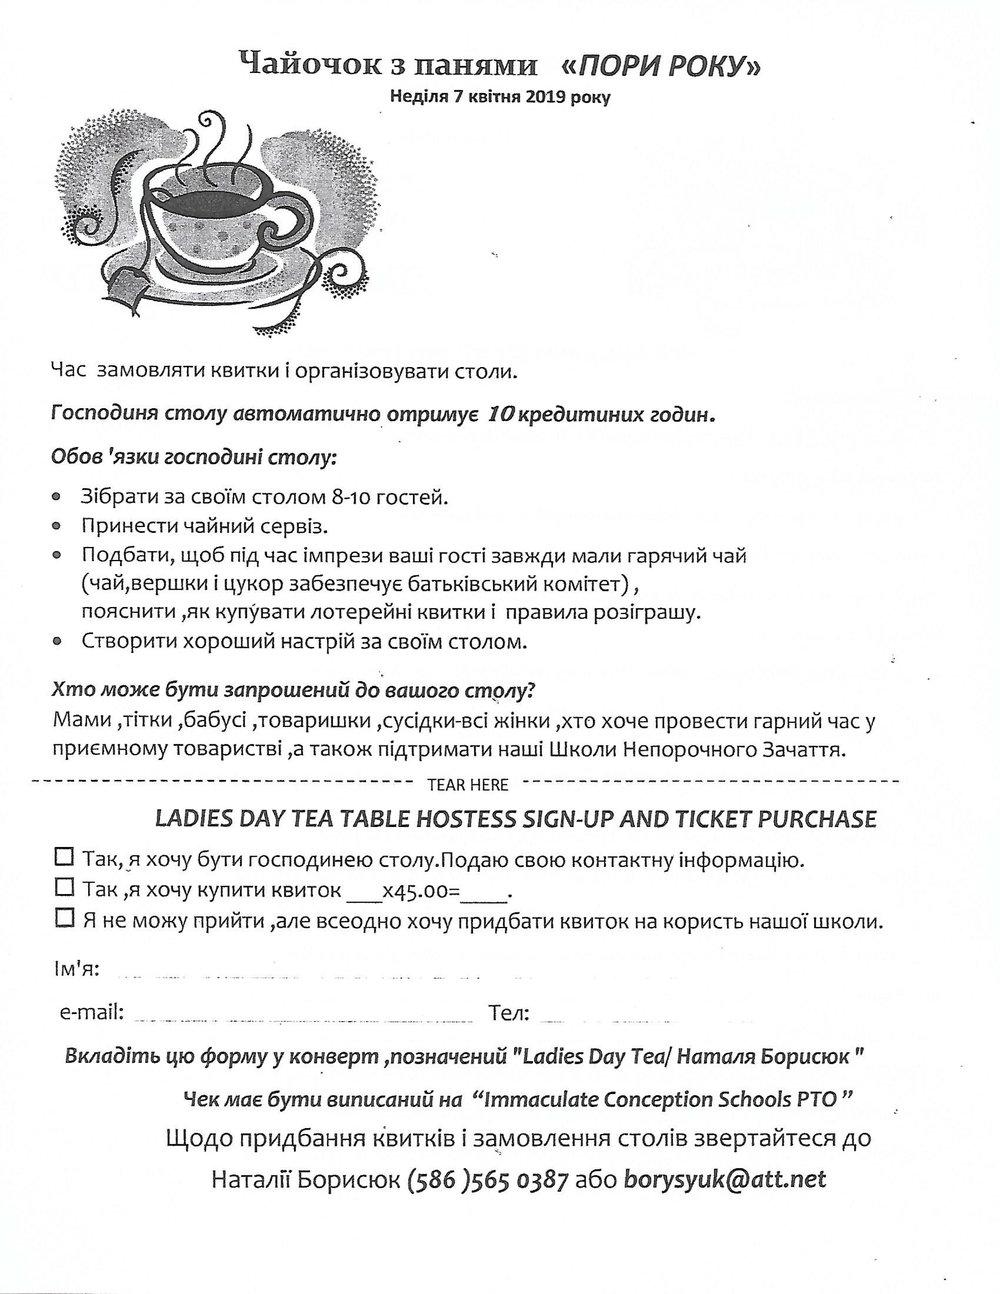 Tea Hostess-2.jpg